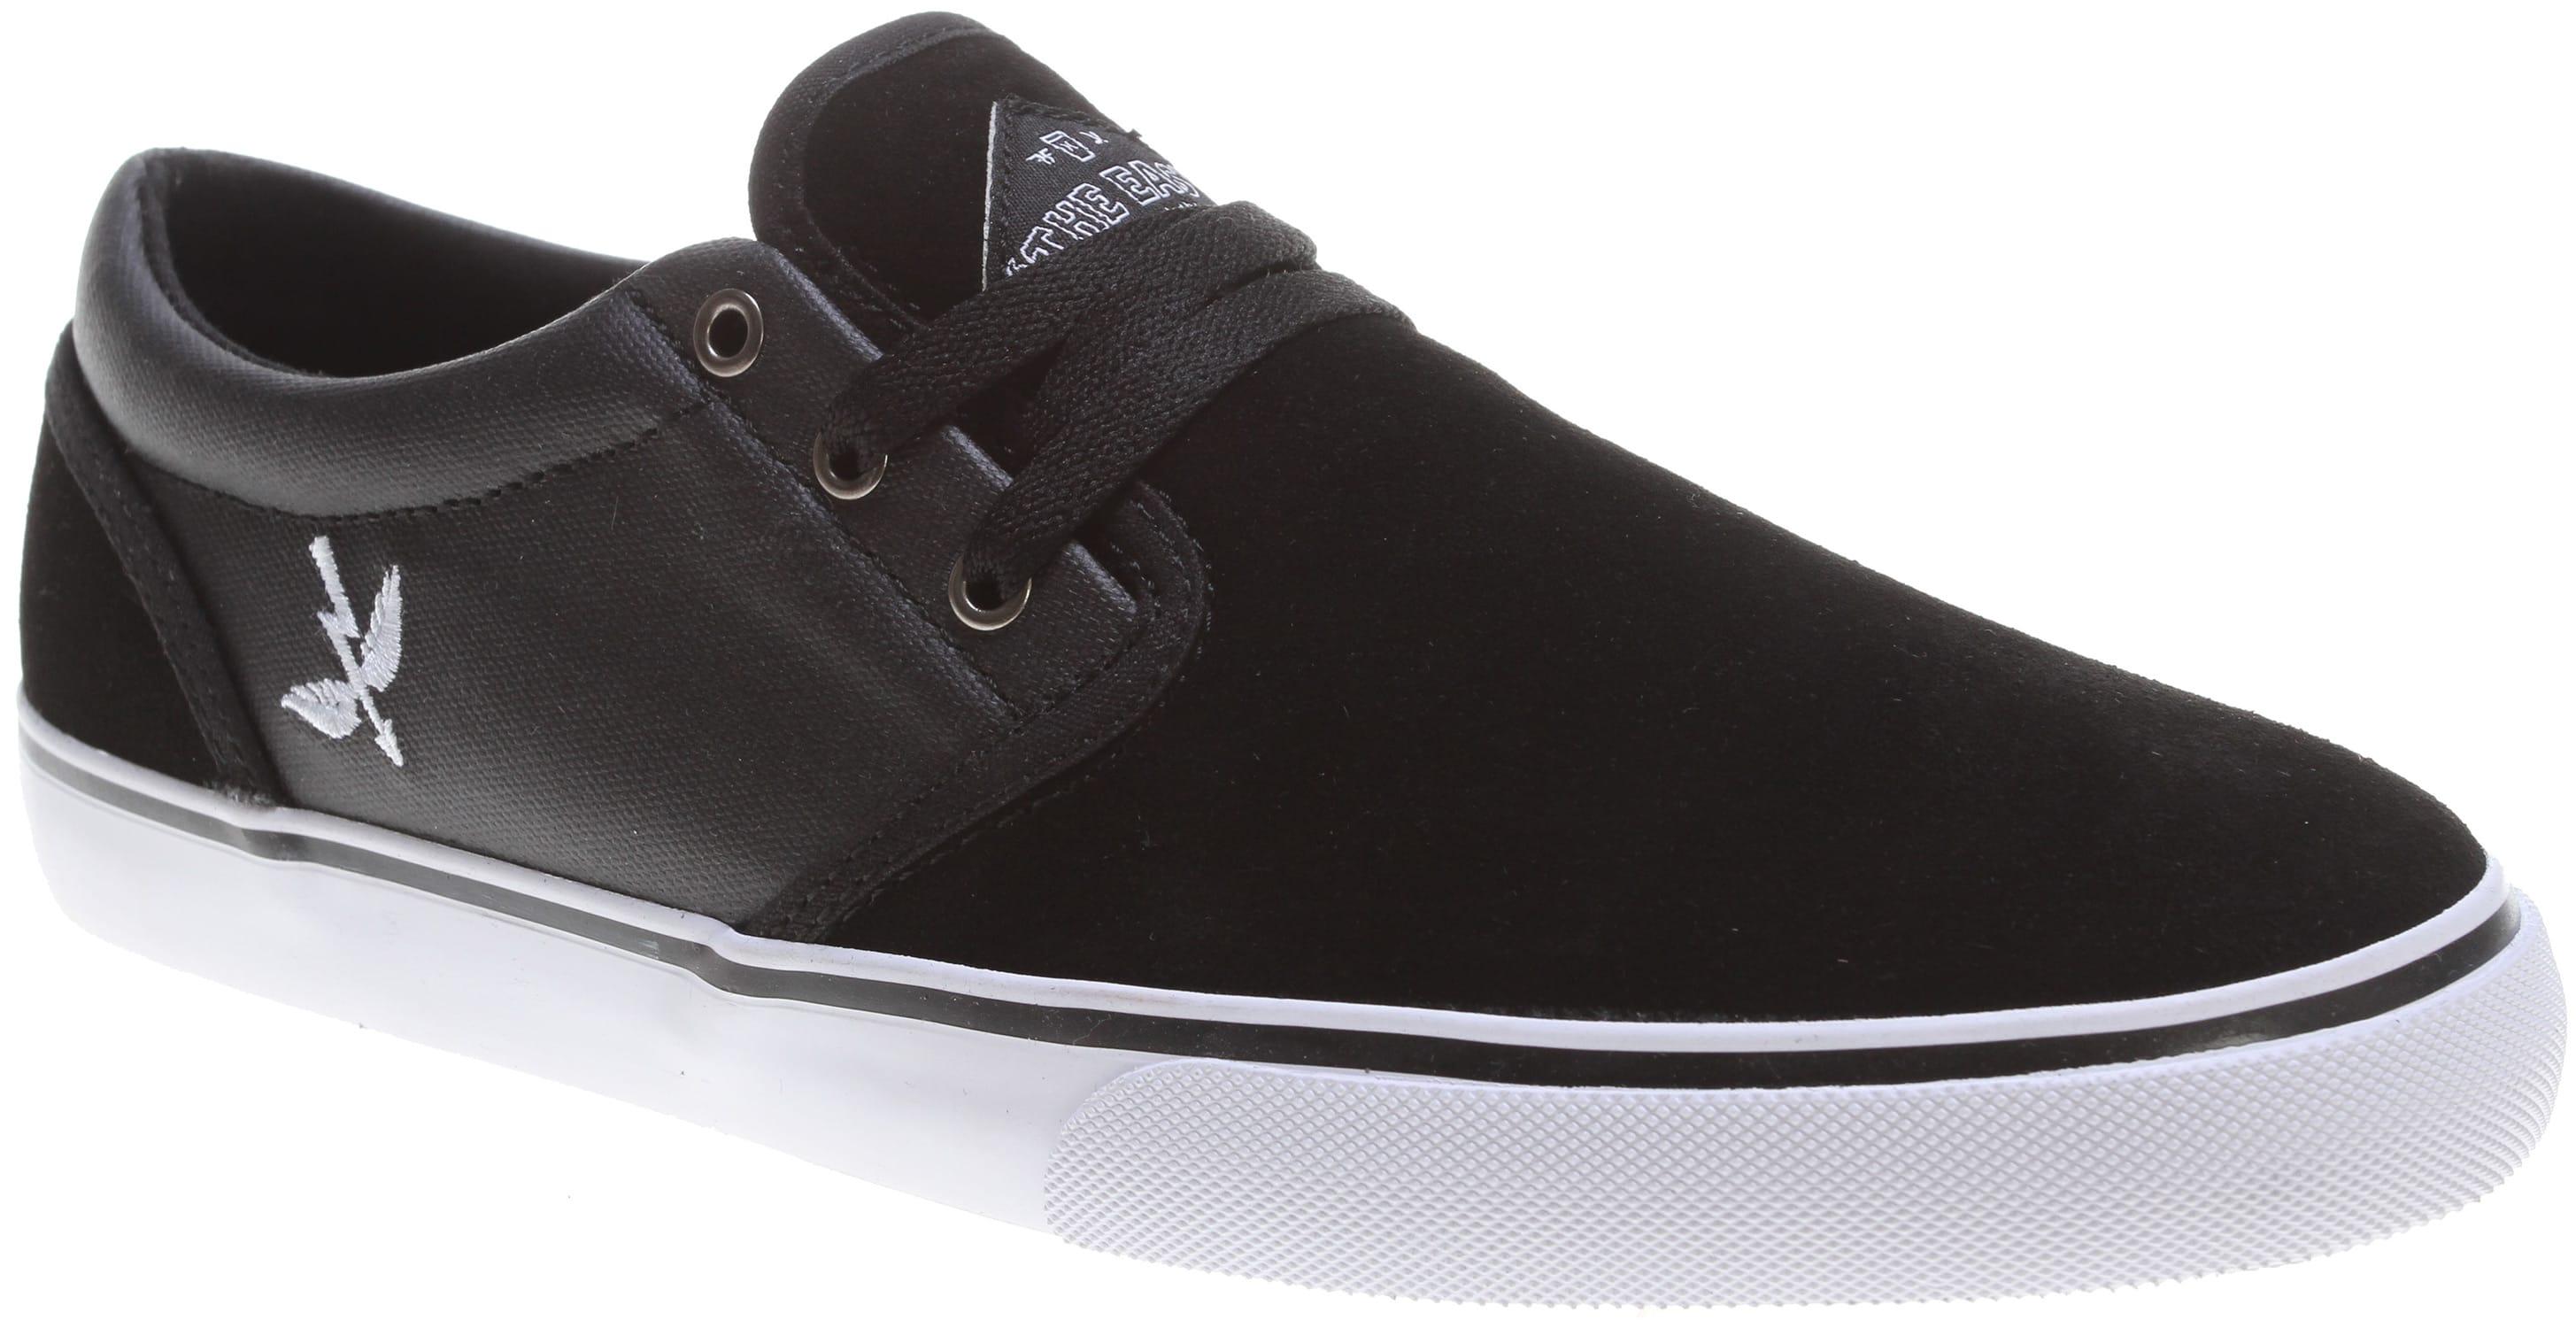 c7df5d328e Fallen The Easy Skate Shoes - thumbnail 2